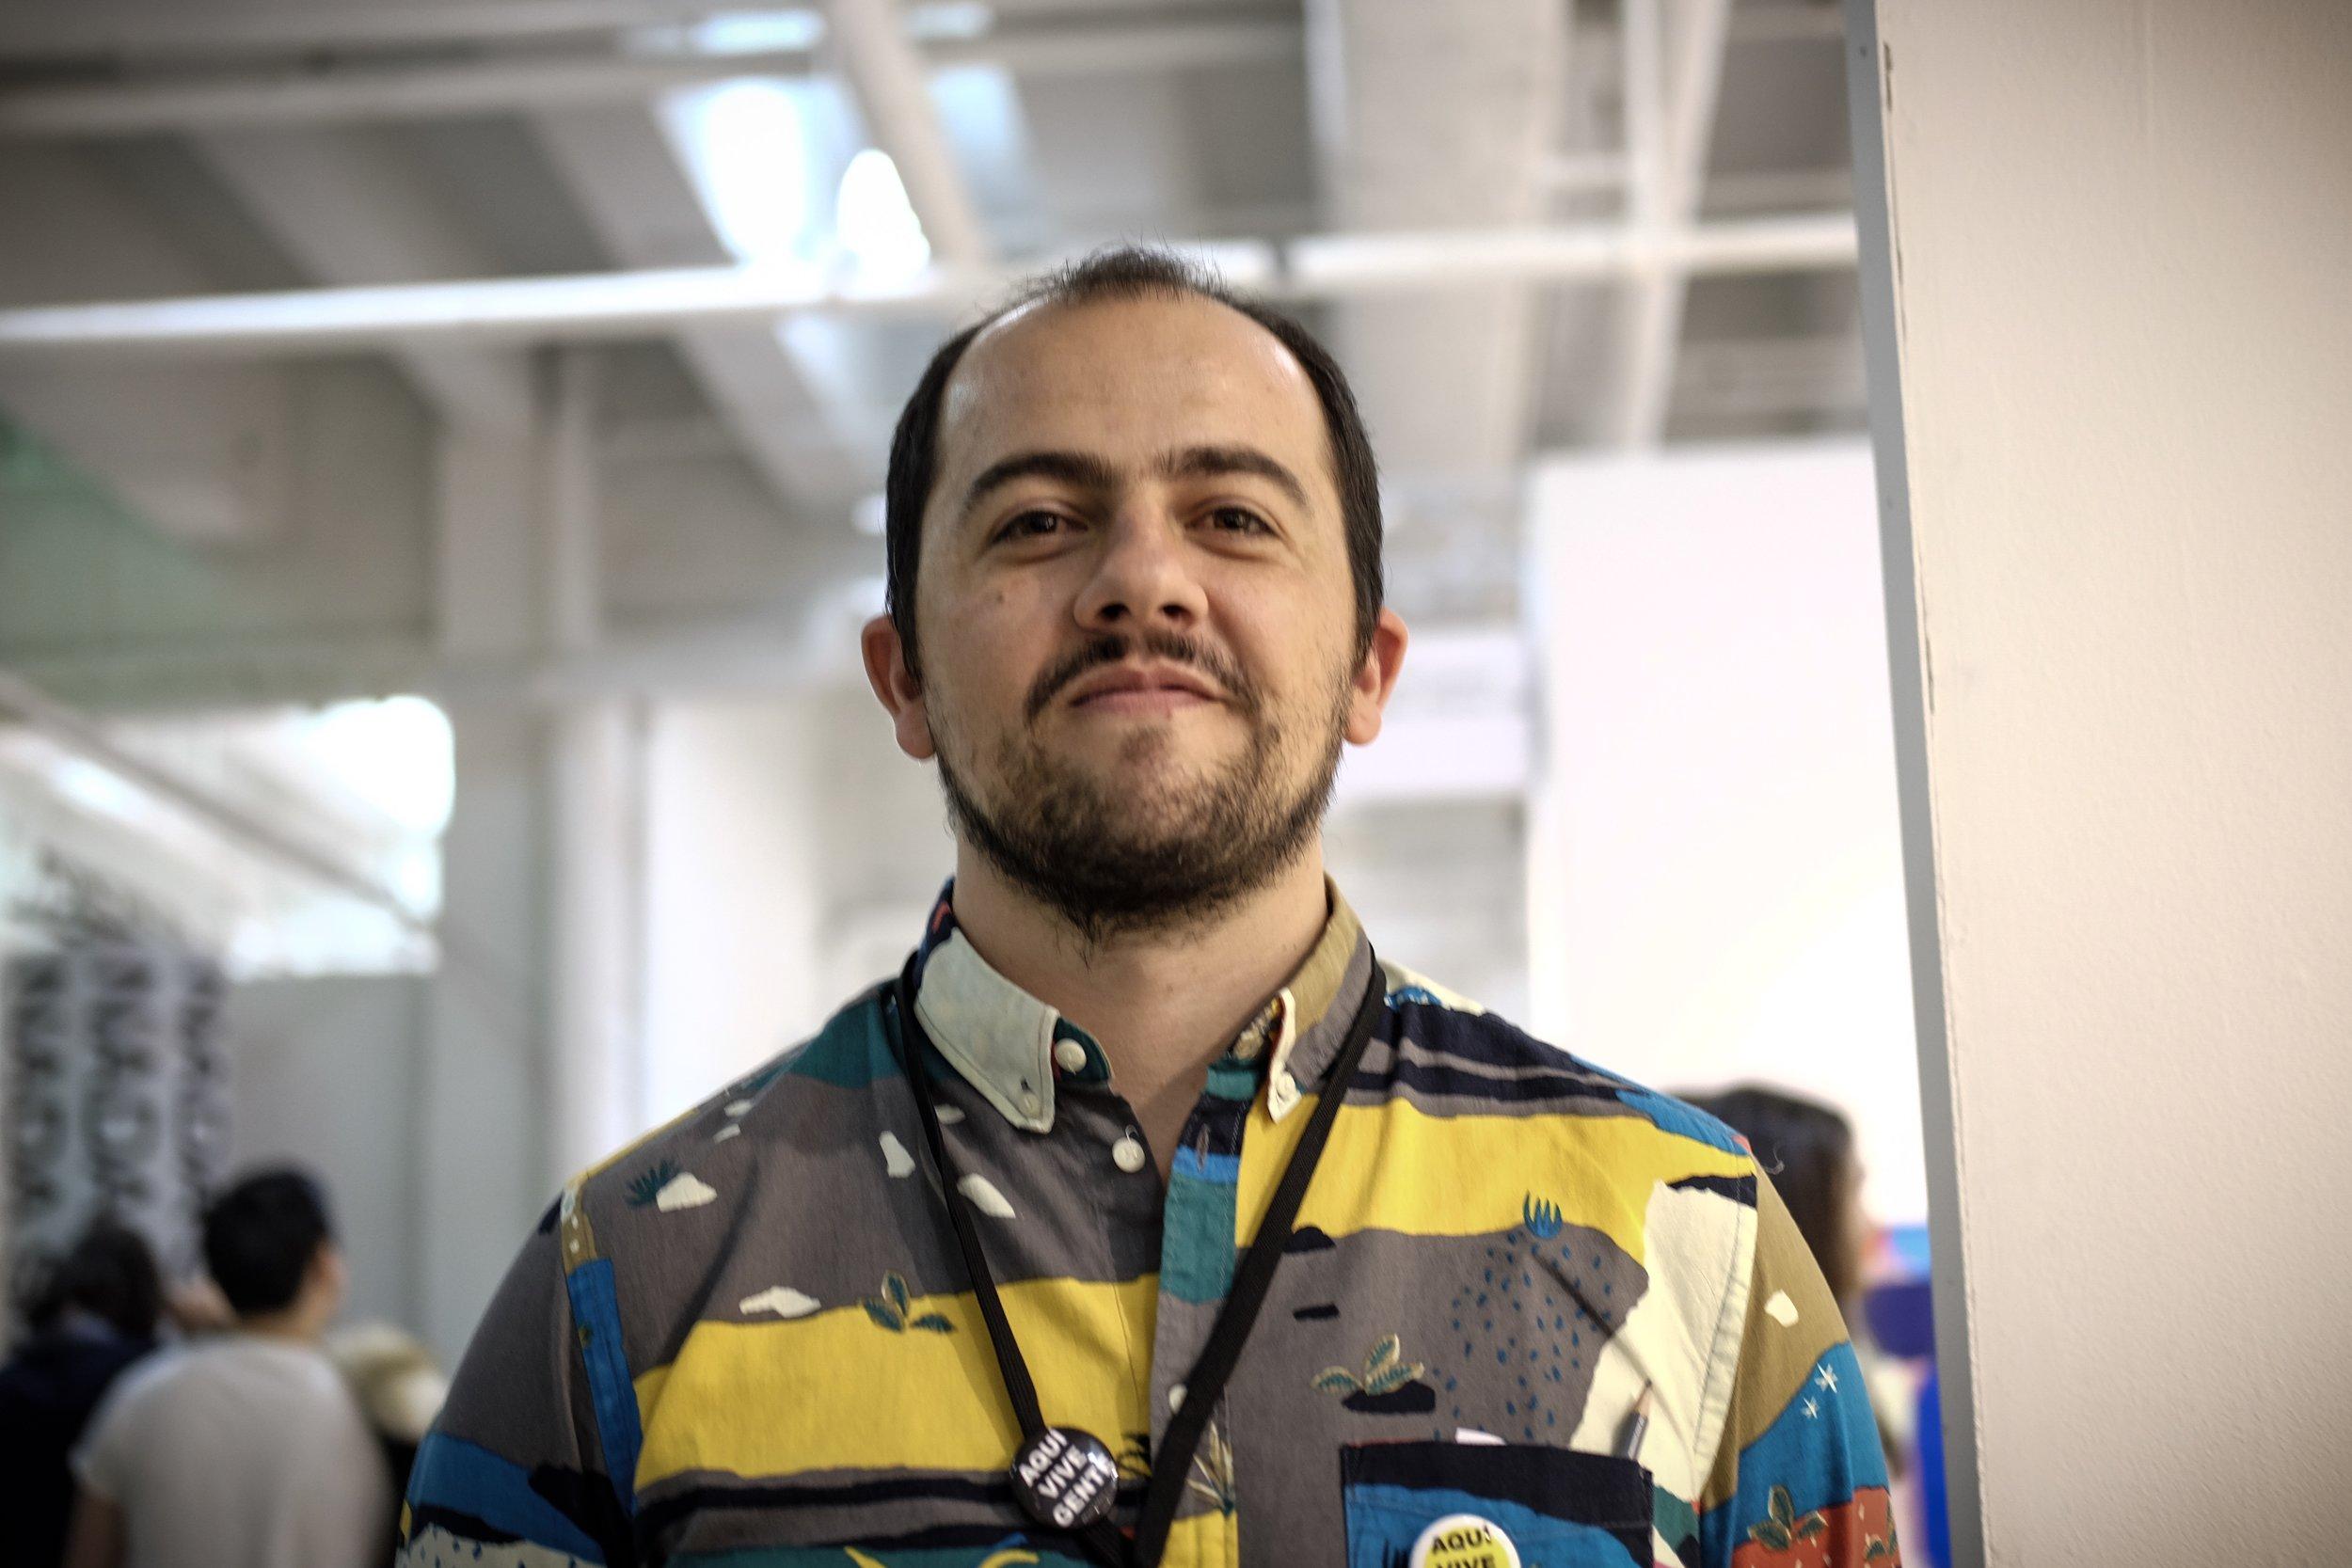 Stephan Benchoam